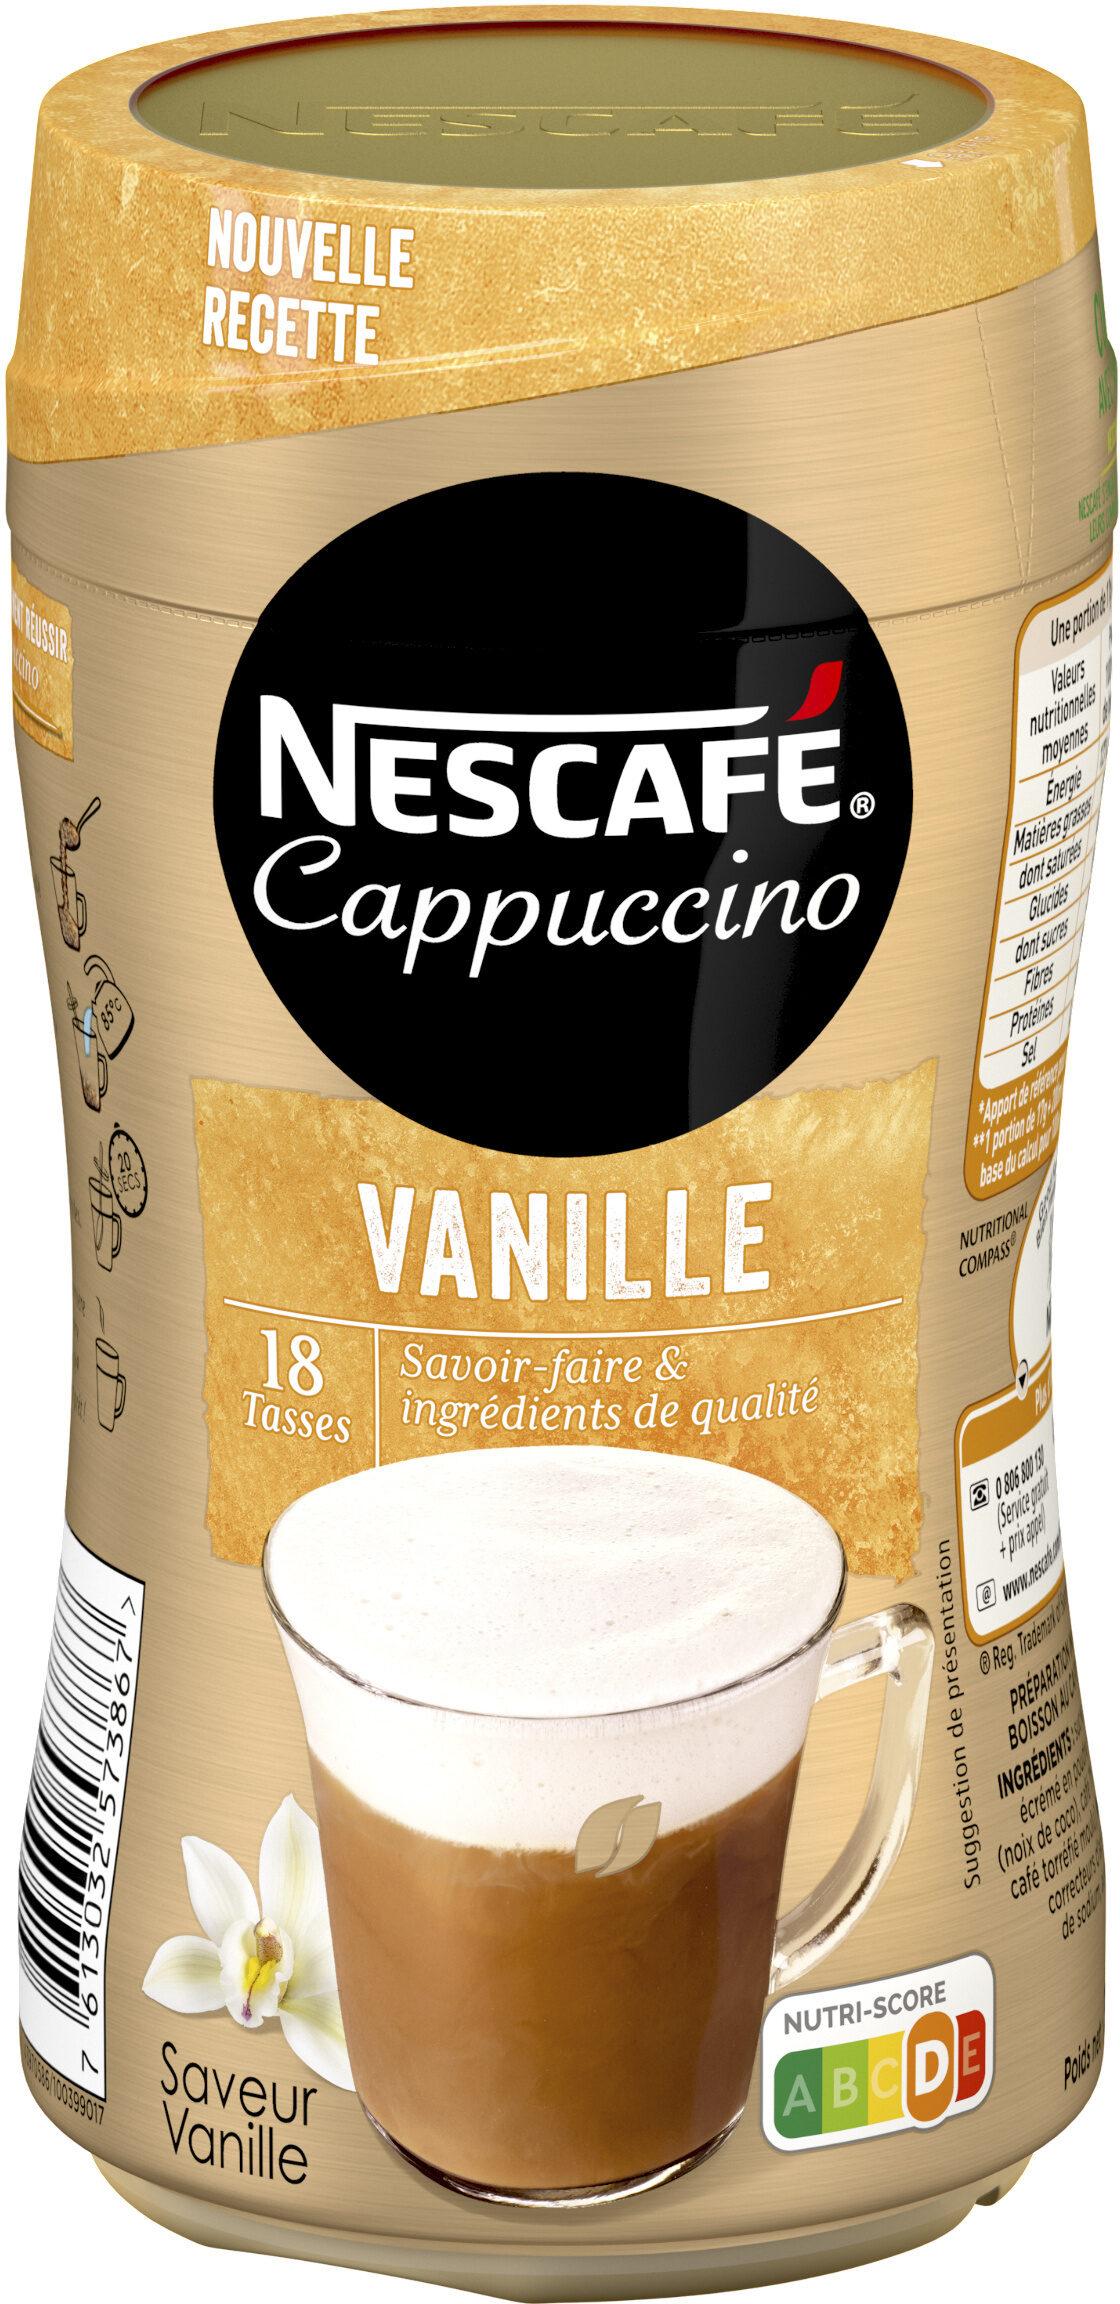 NESCAFE Cappuccino Vanille, Café soluble, Boîte de - Produit - fr